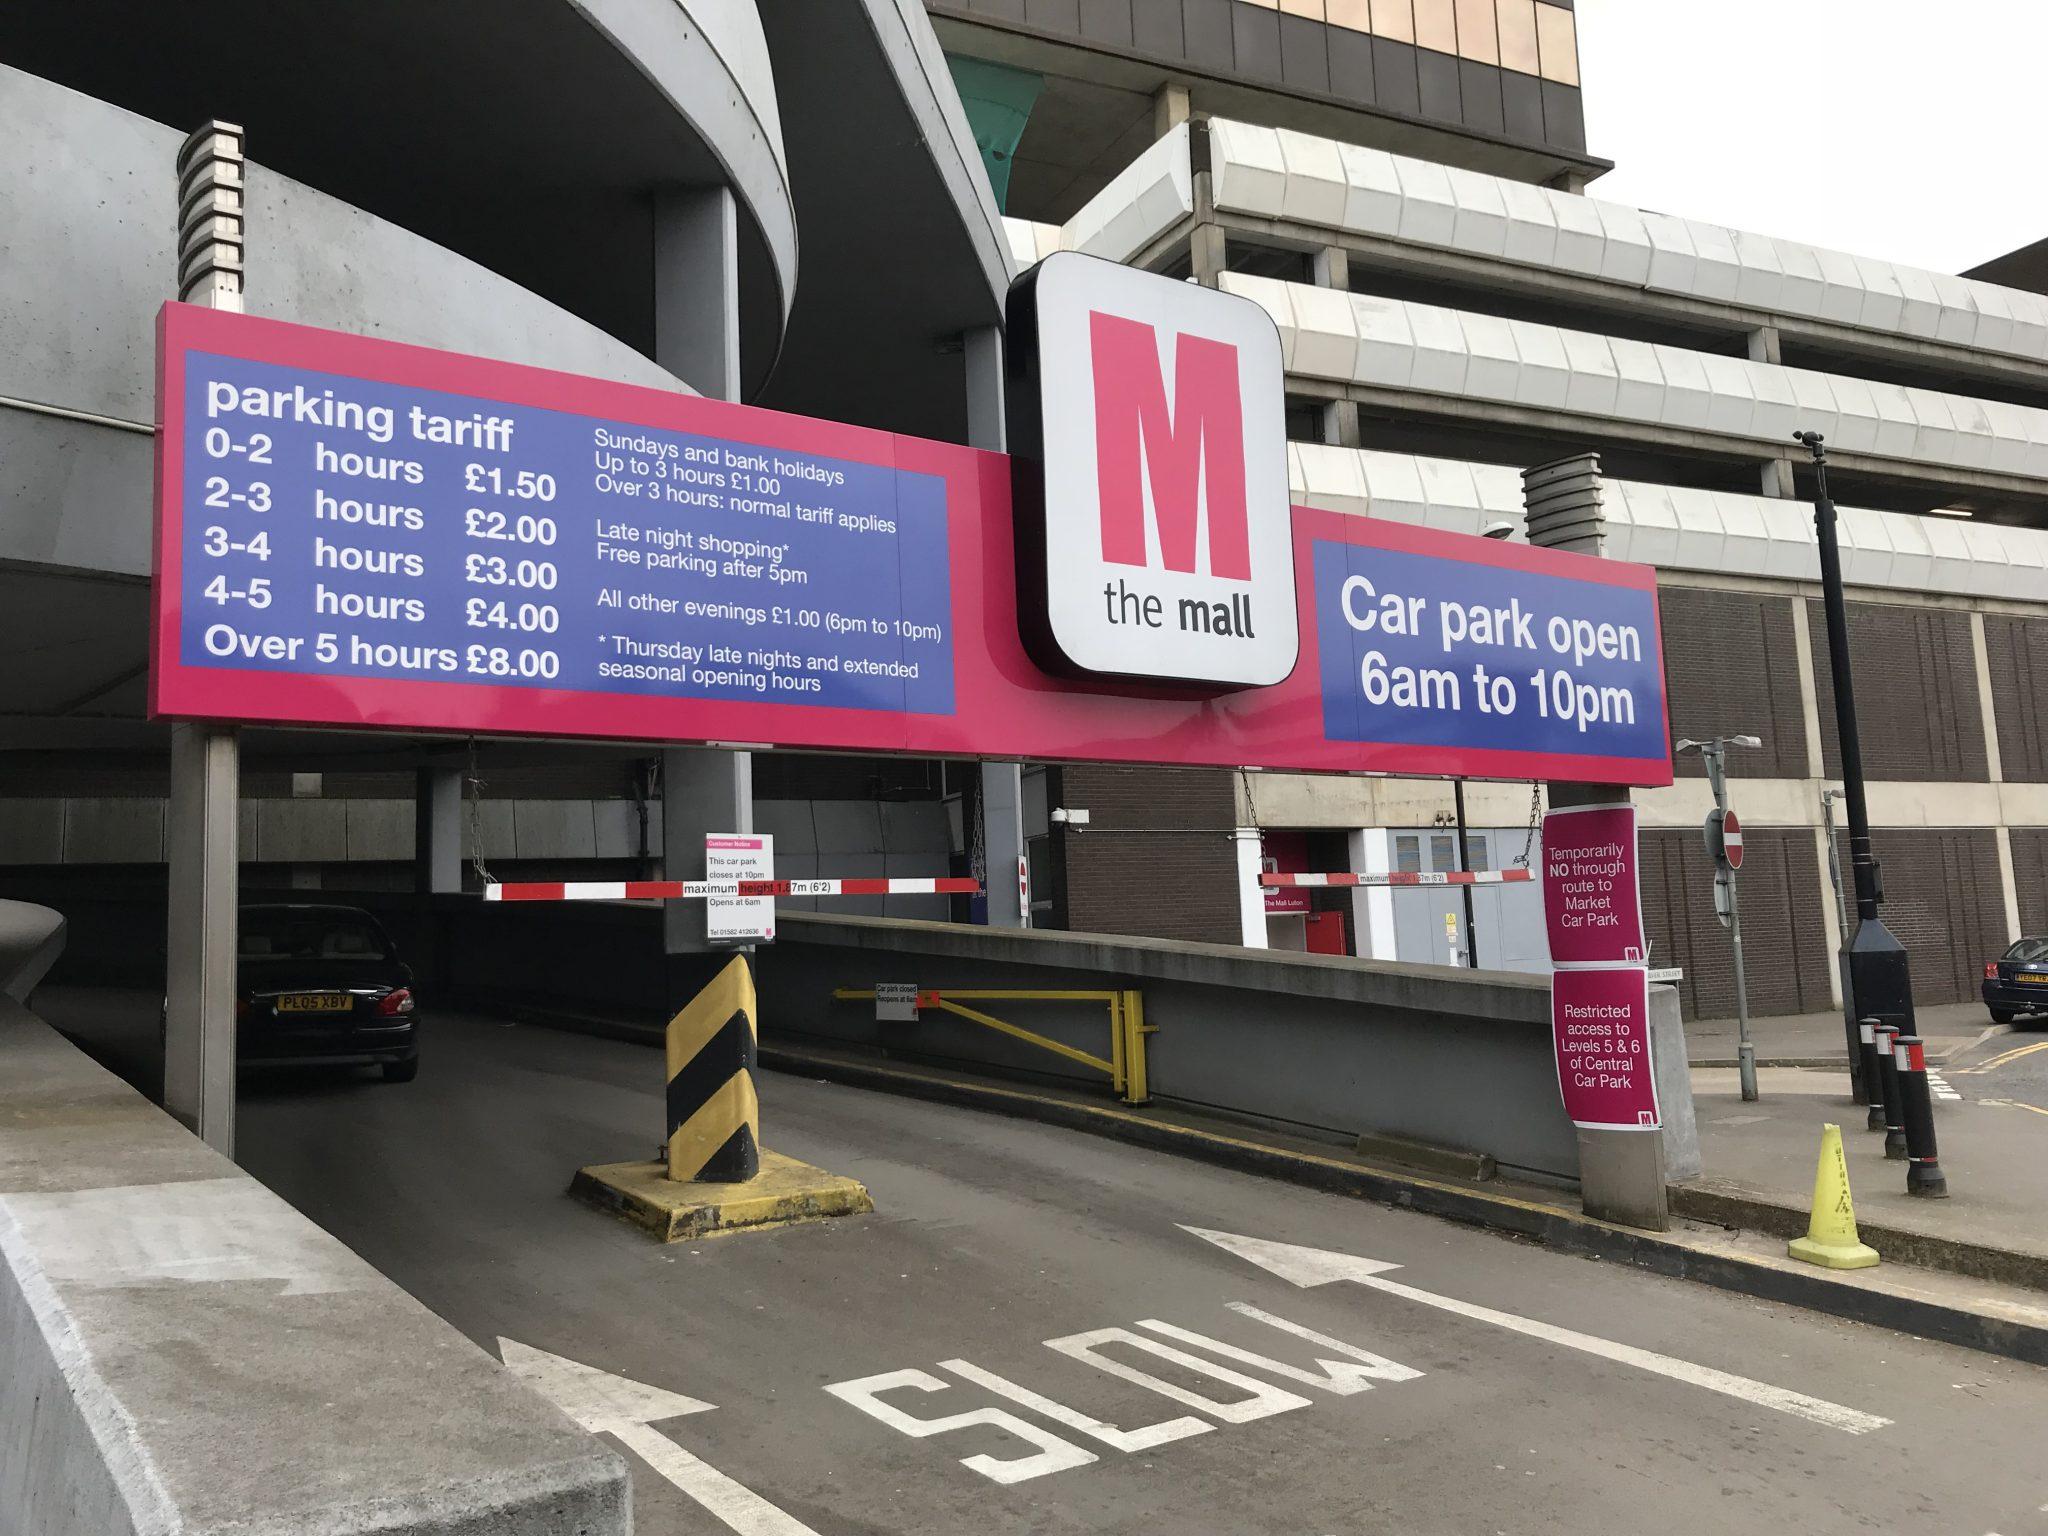 Car park entrance signage